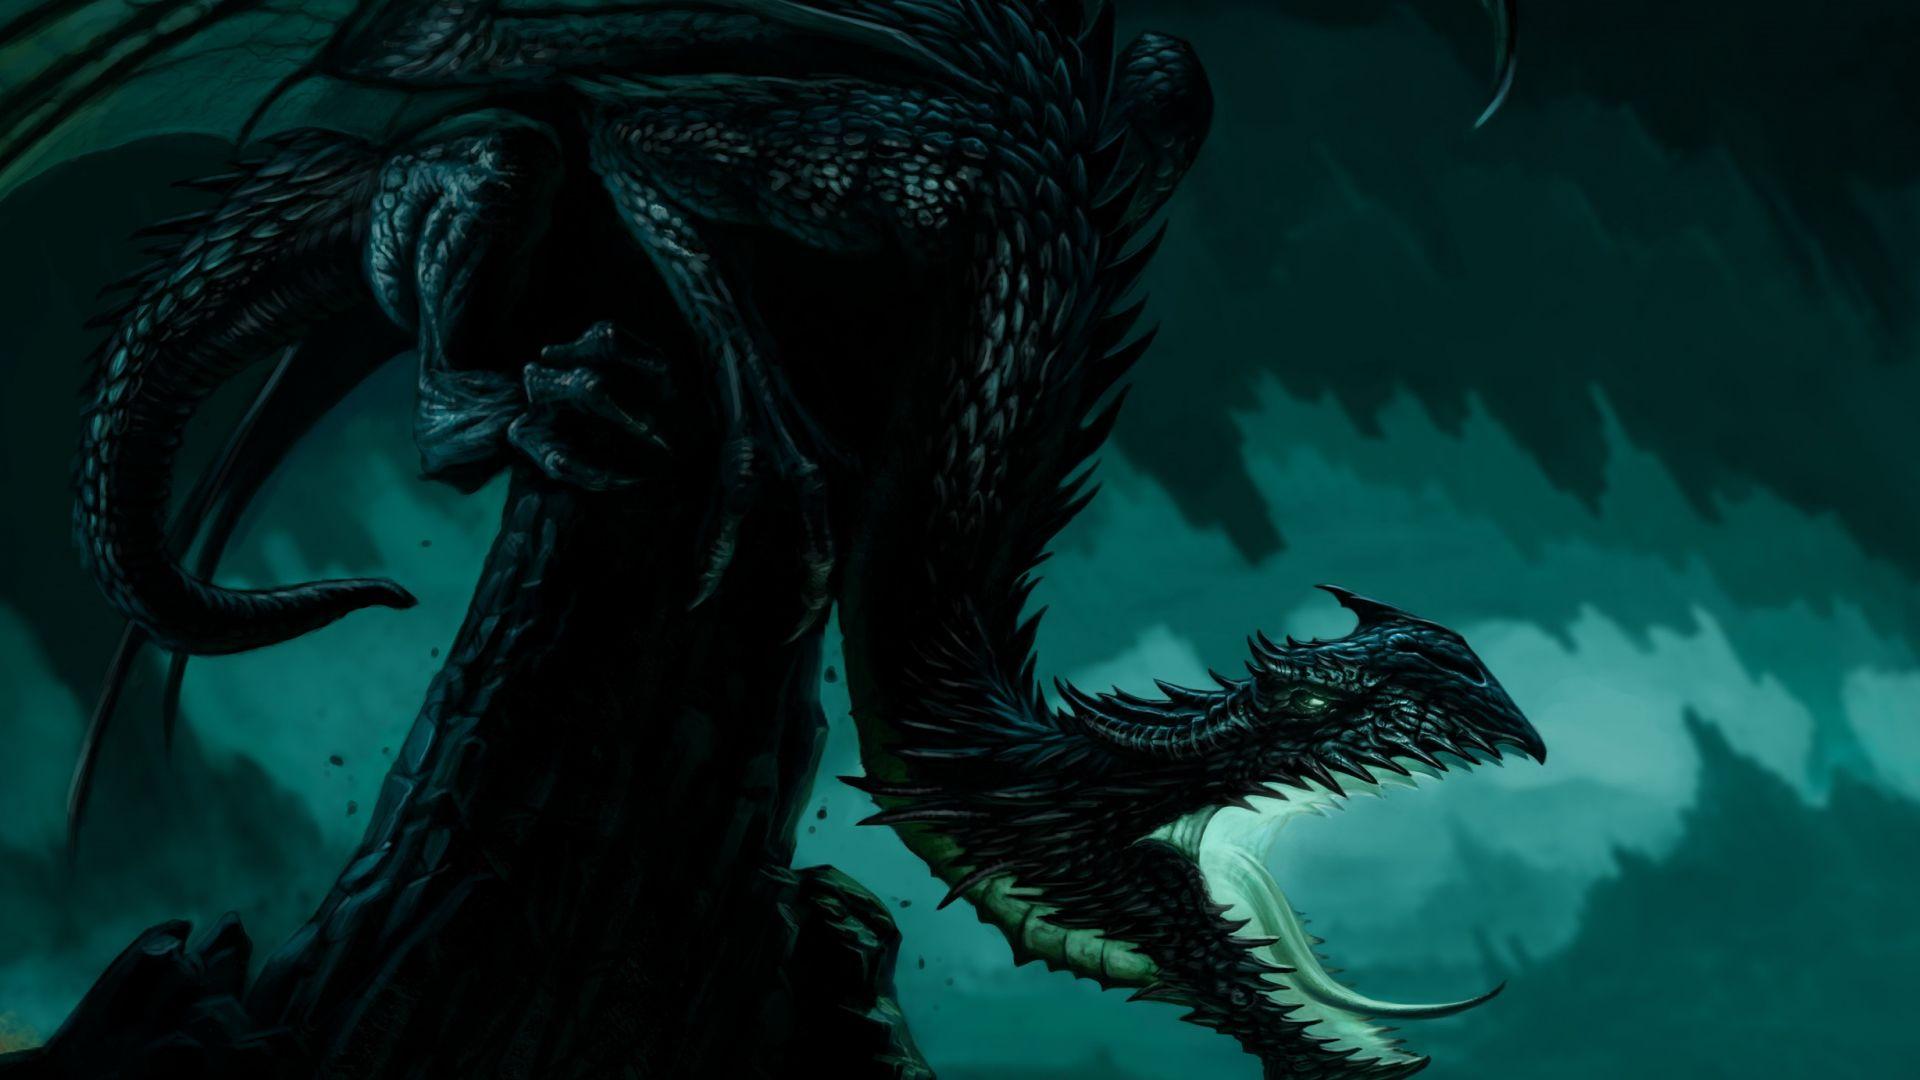 Black Dragon Fantasy Art